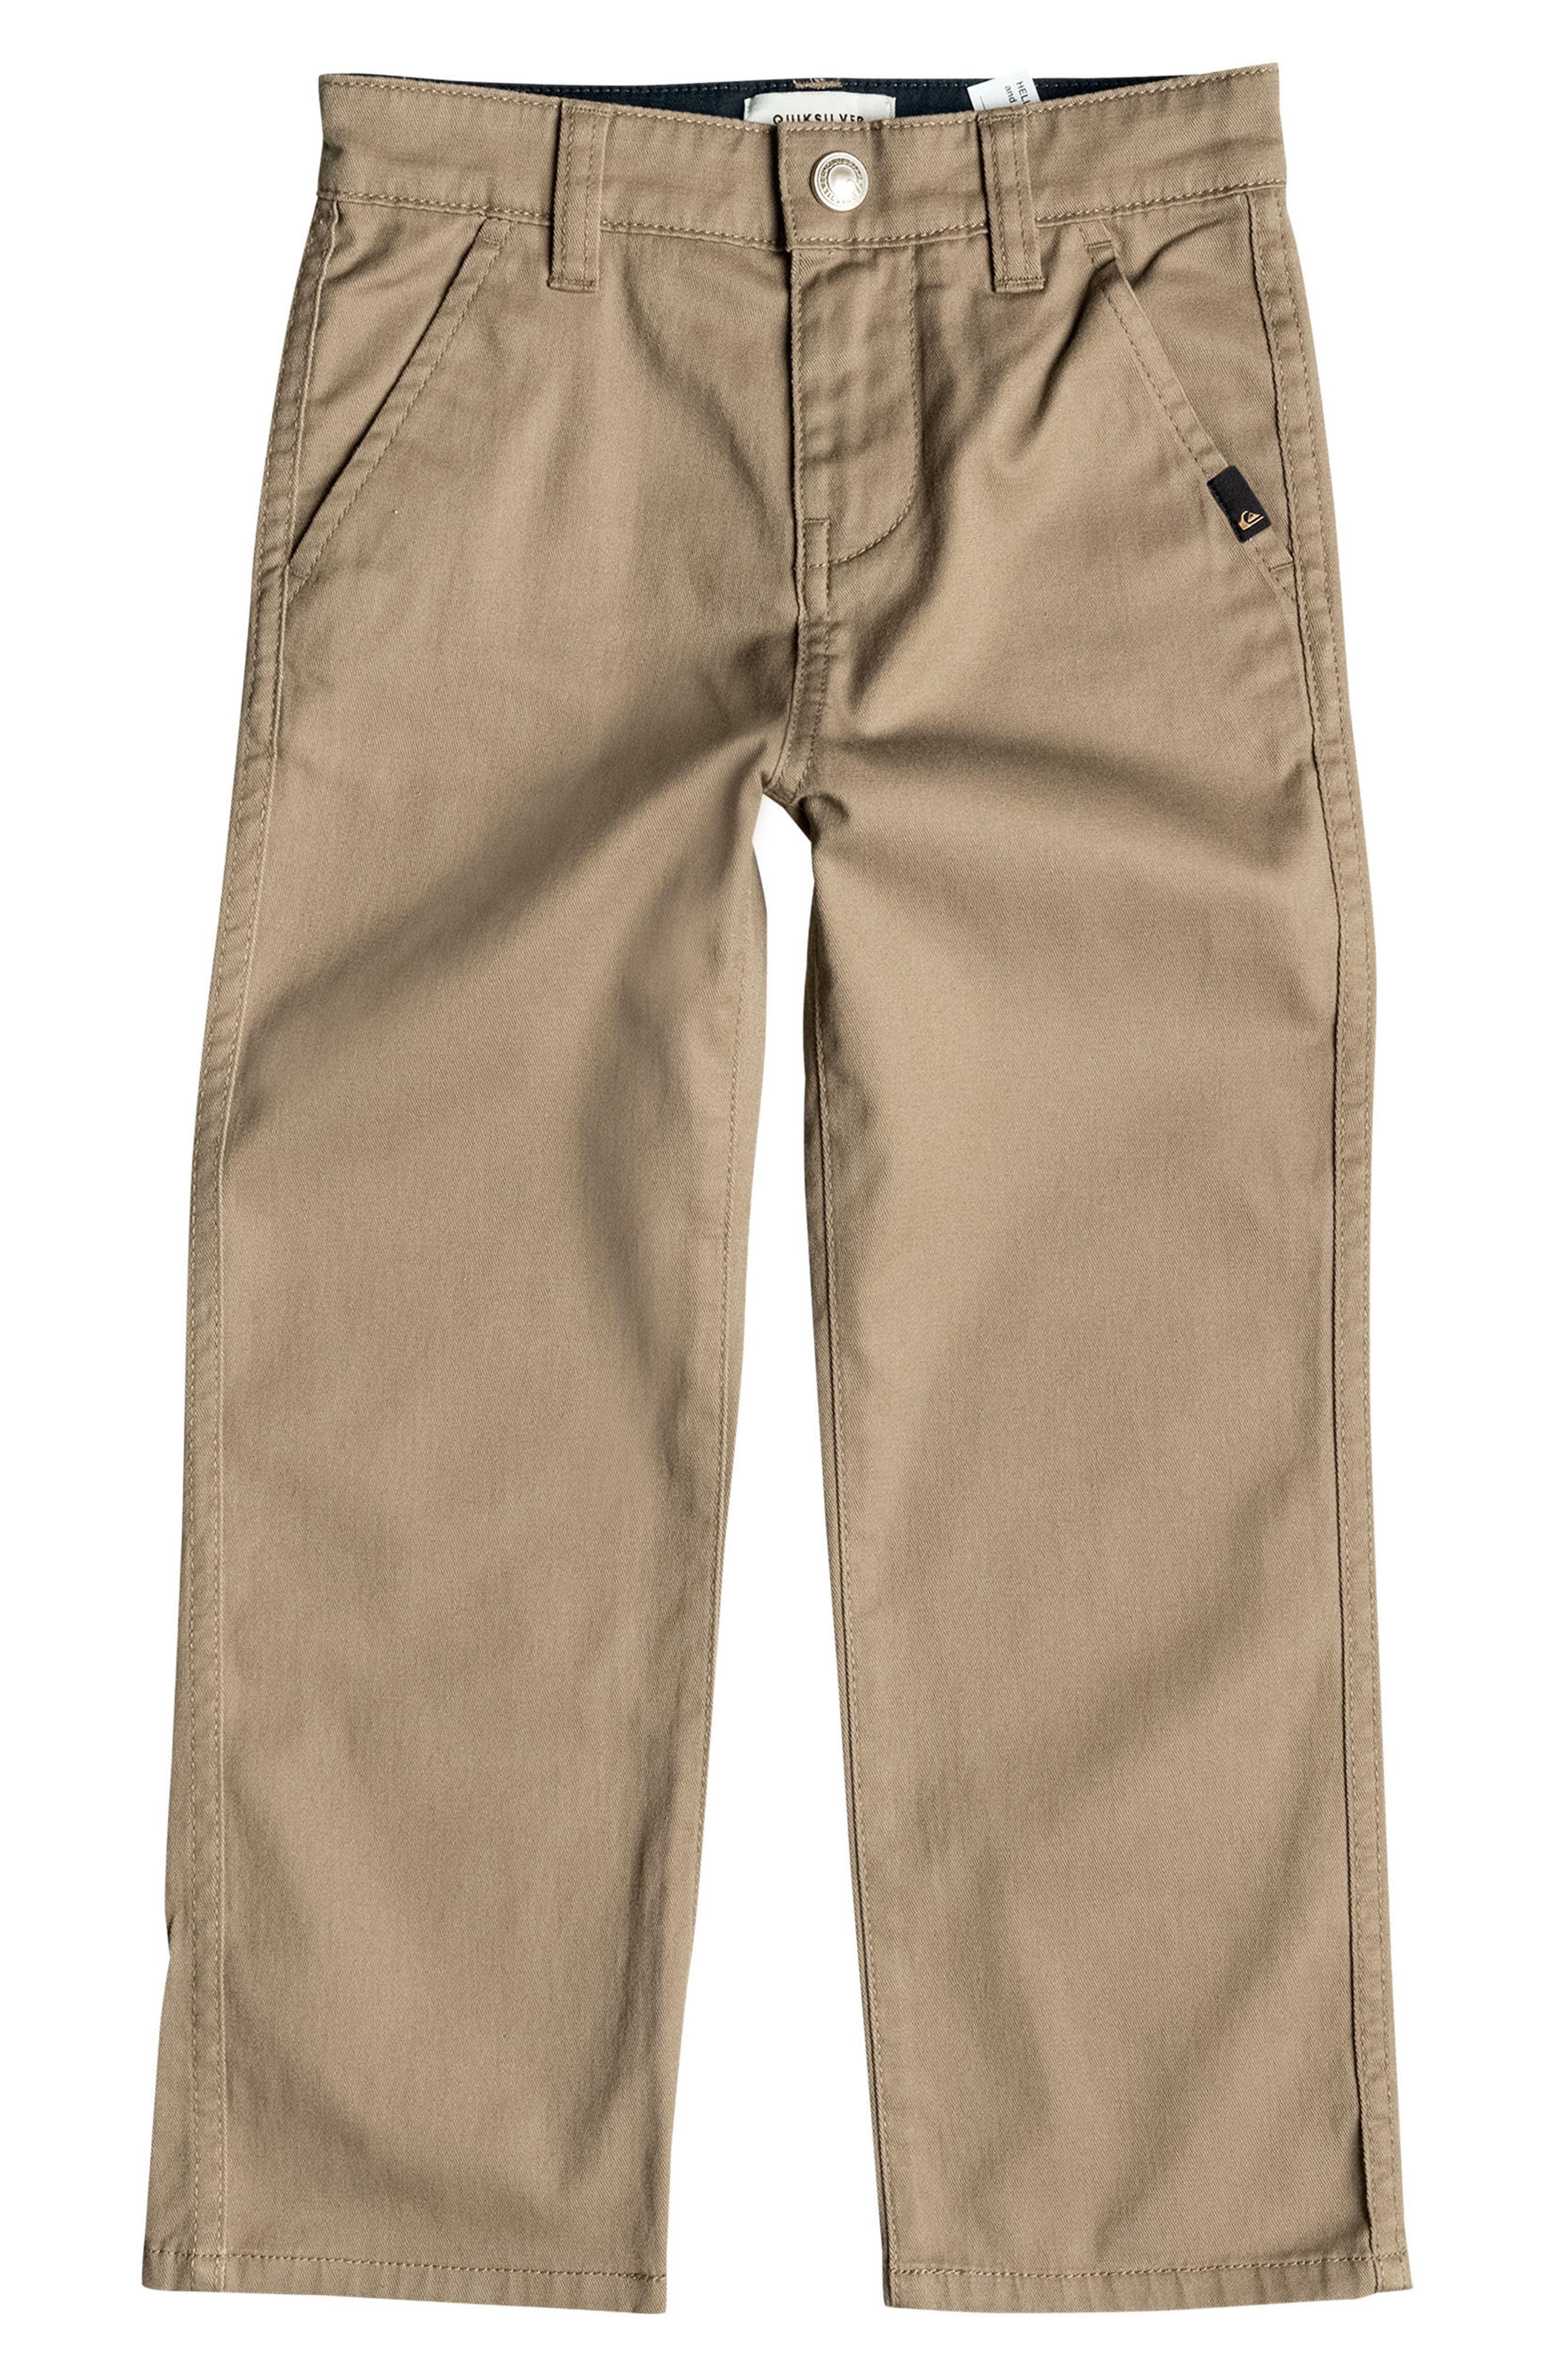 Main Image - Quiksilver Everyday Union Pants (Toddler Boys & Little Boys)